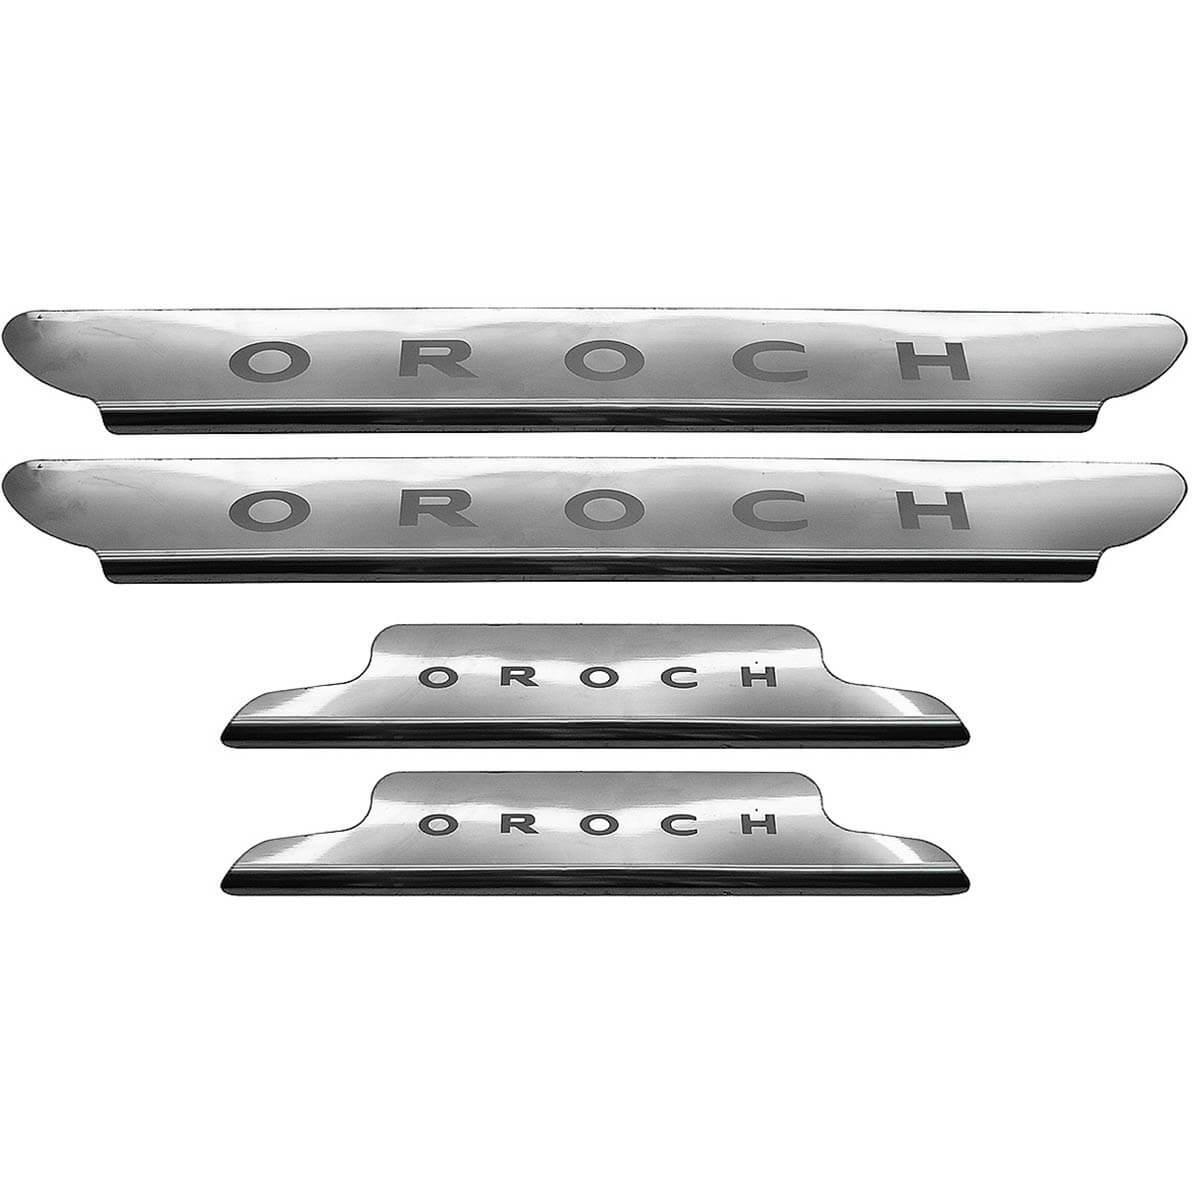 Protetor de soleira aço inox Duster Oroch 2016 2017